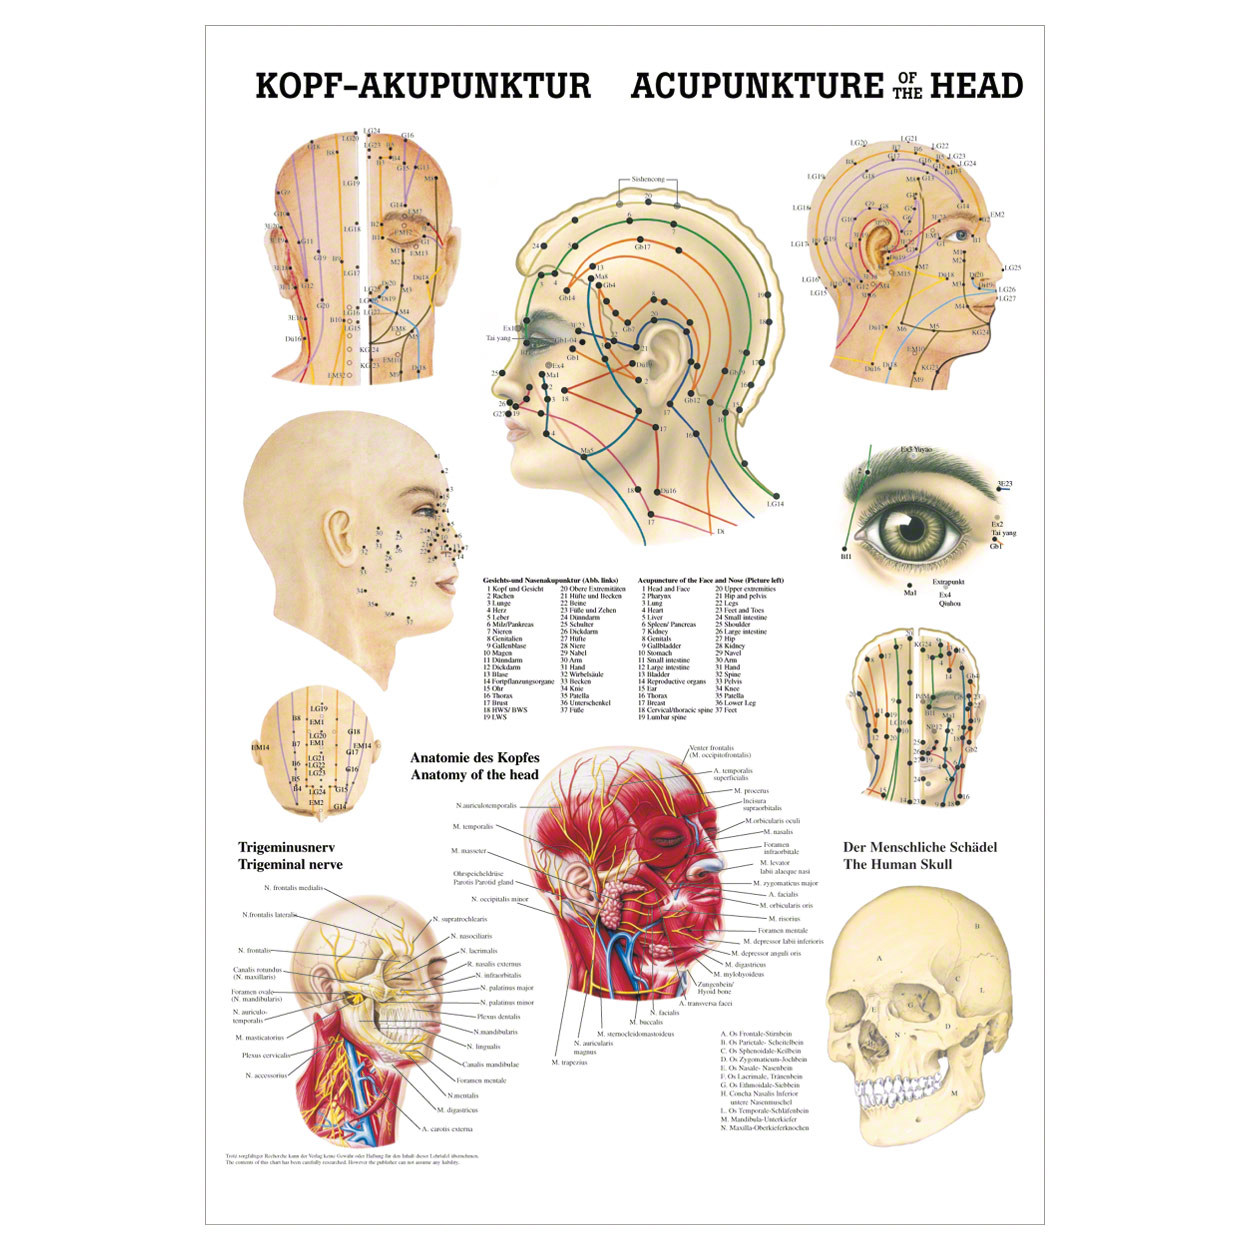 Kopf-Akupunktur Poster Anatomie 70x50 cm medizinische Lehrmittel | eBay